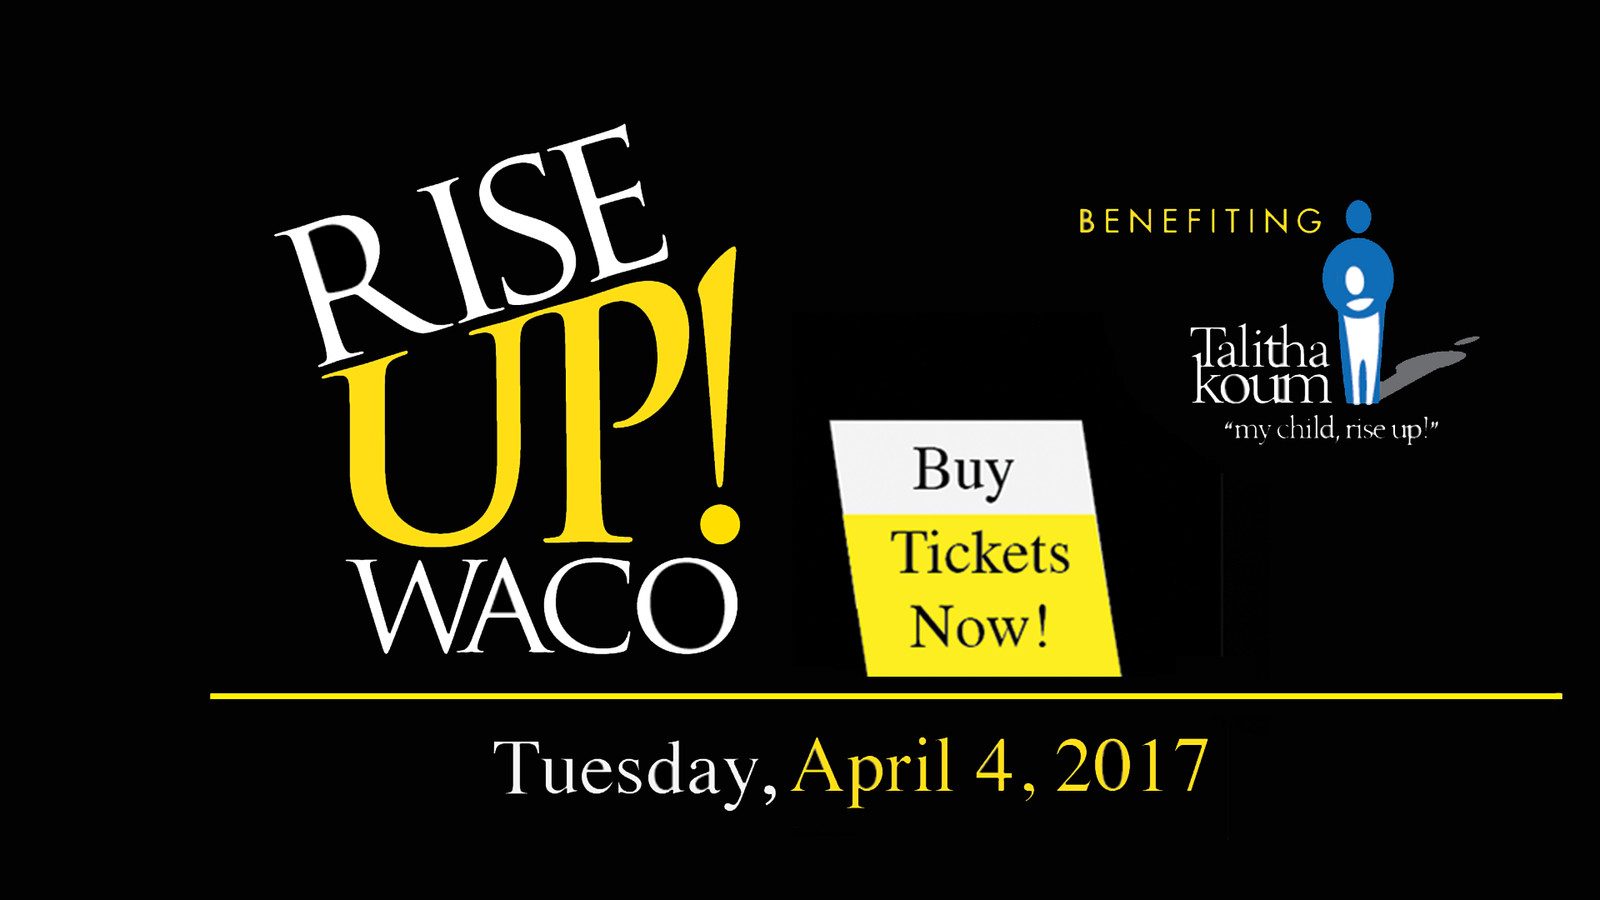 Rise_up_waco.0